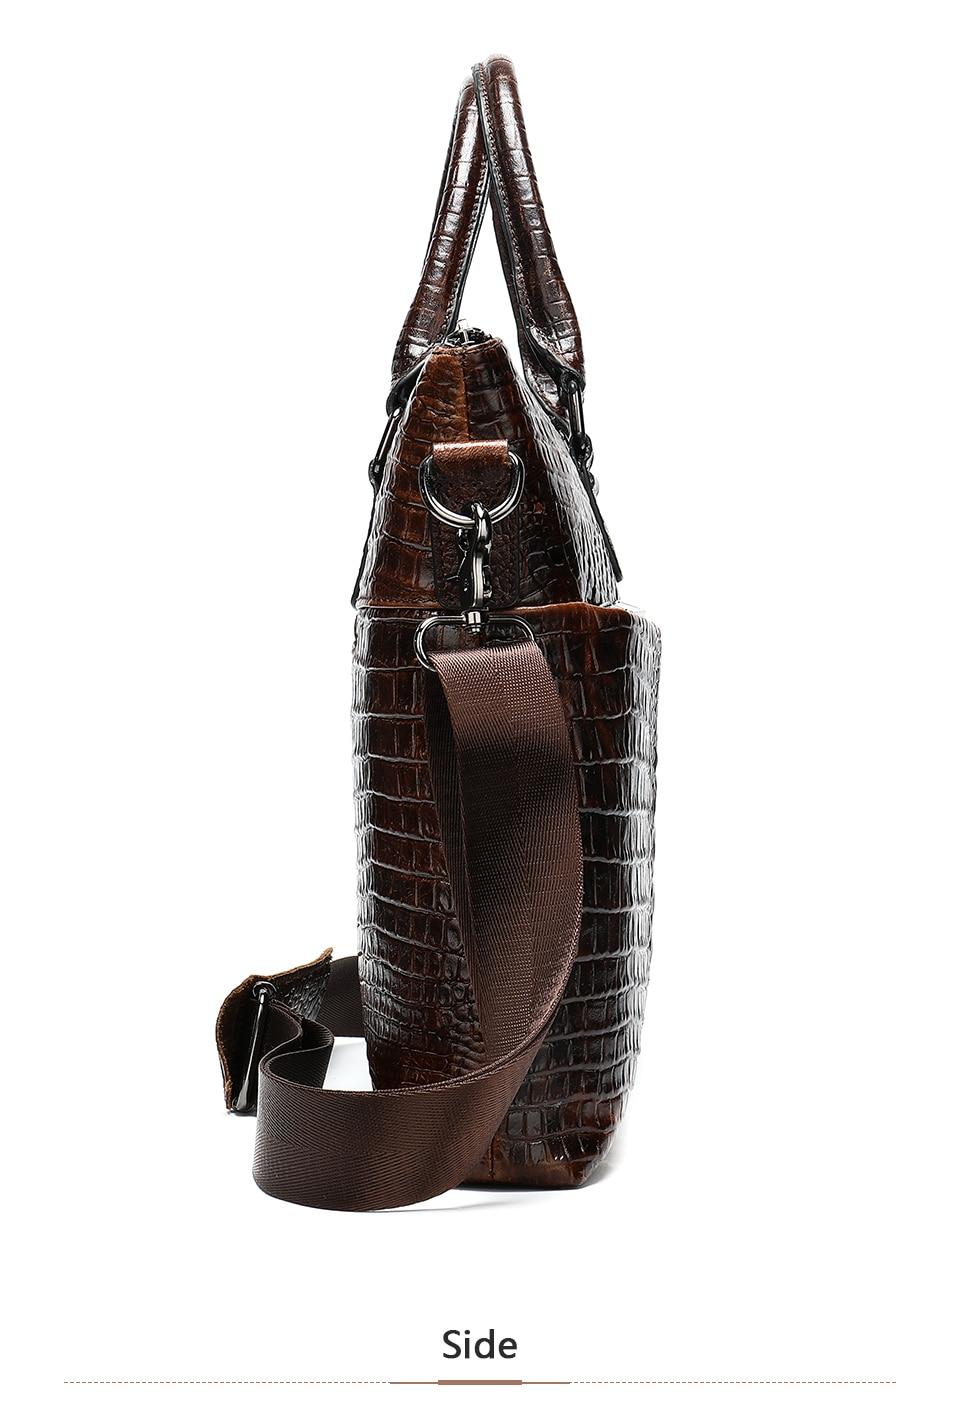 HTB1bBfUe2WG3KVjSZPcq6zkbXXa5 WESTAL Men Briefcase Men's Bag Genuine Leather Office Bags for Men Laptop Bag Leather Briefcase Men Croco Design Computer Bags